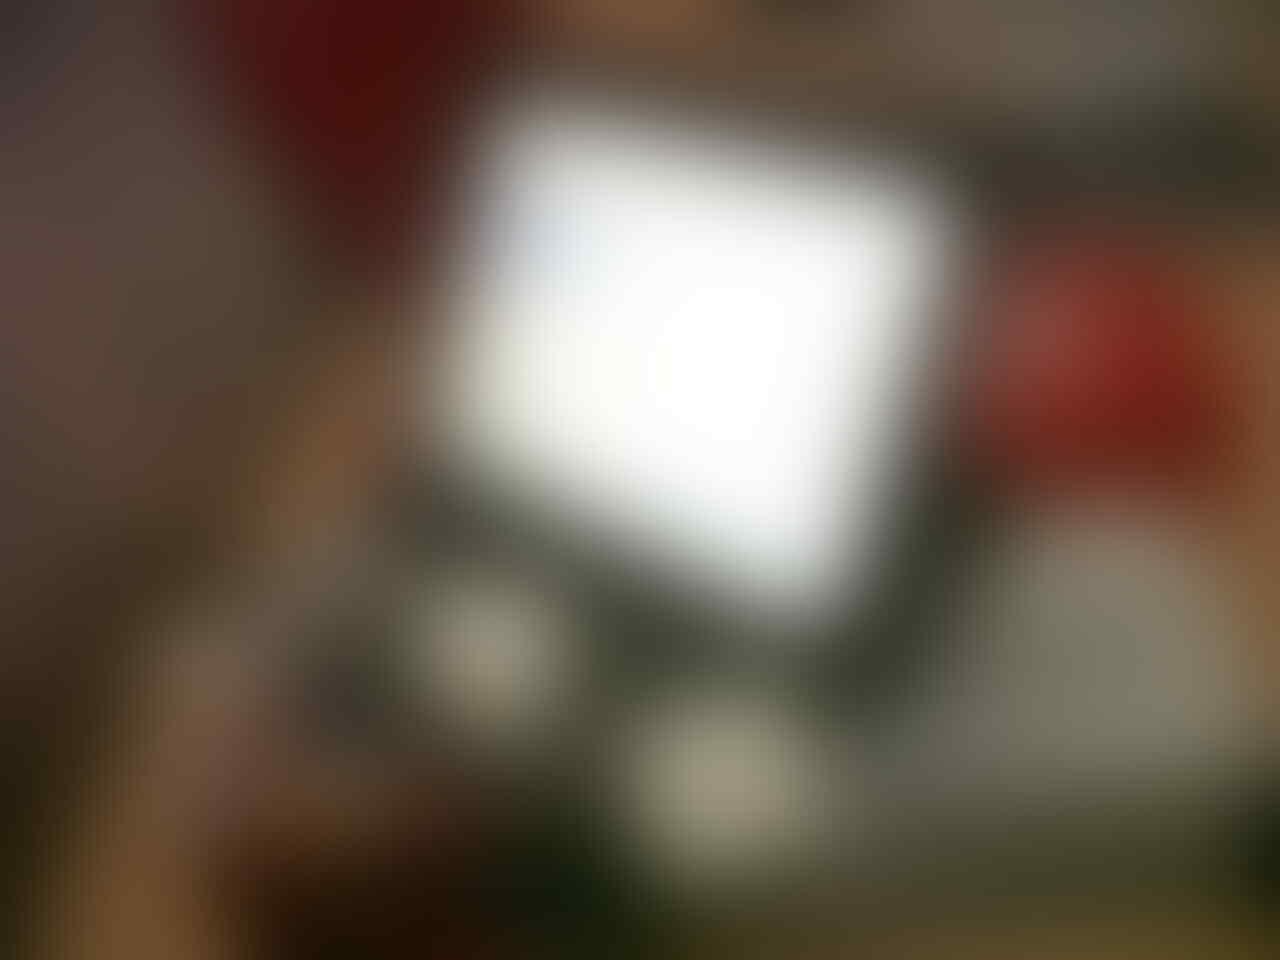 Jual IPAD 3 64 GB Wi-Fi + 4G, Masih Garansi s/d Desember 2013 Hanya 5,1 Juta !!!